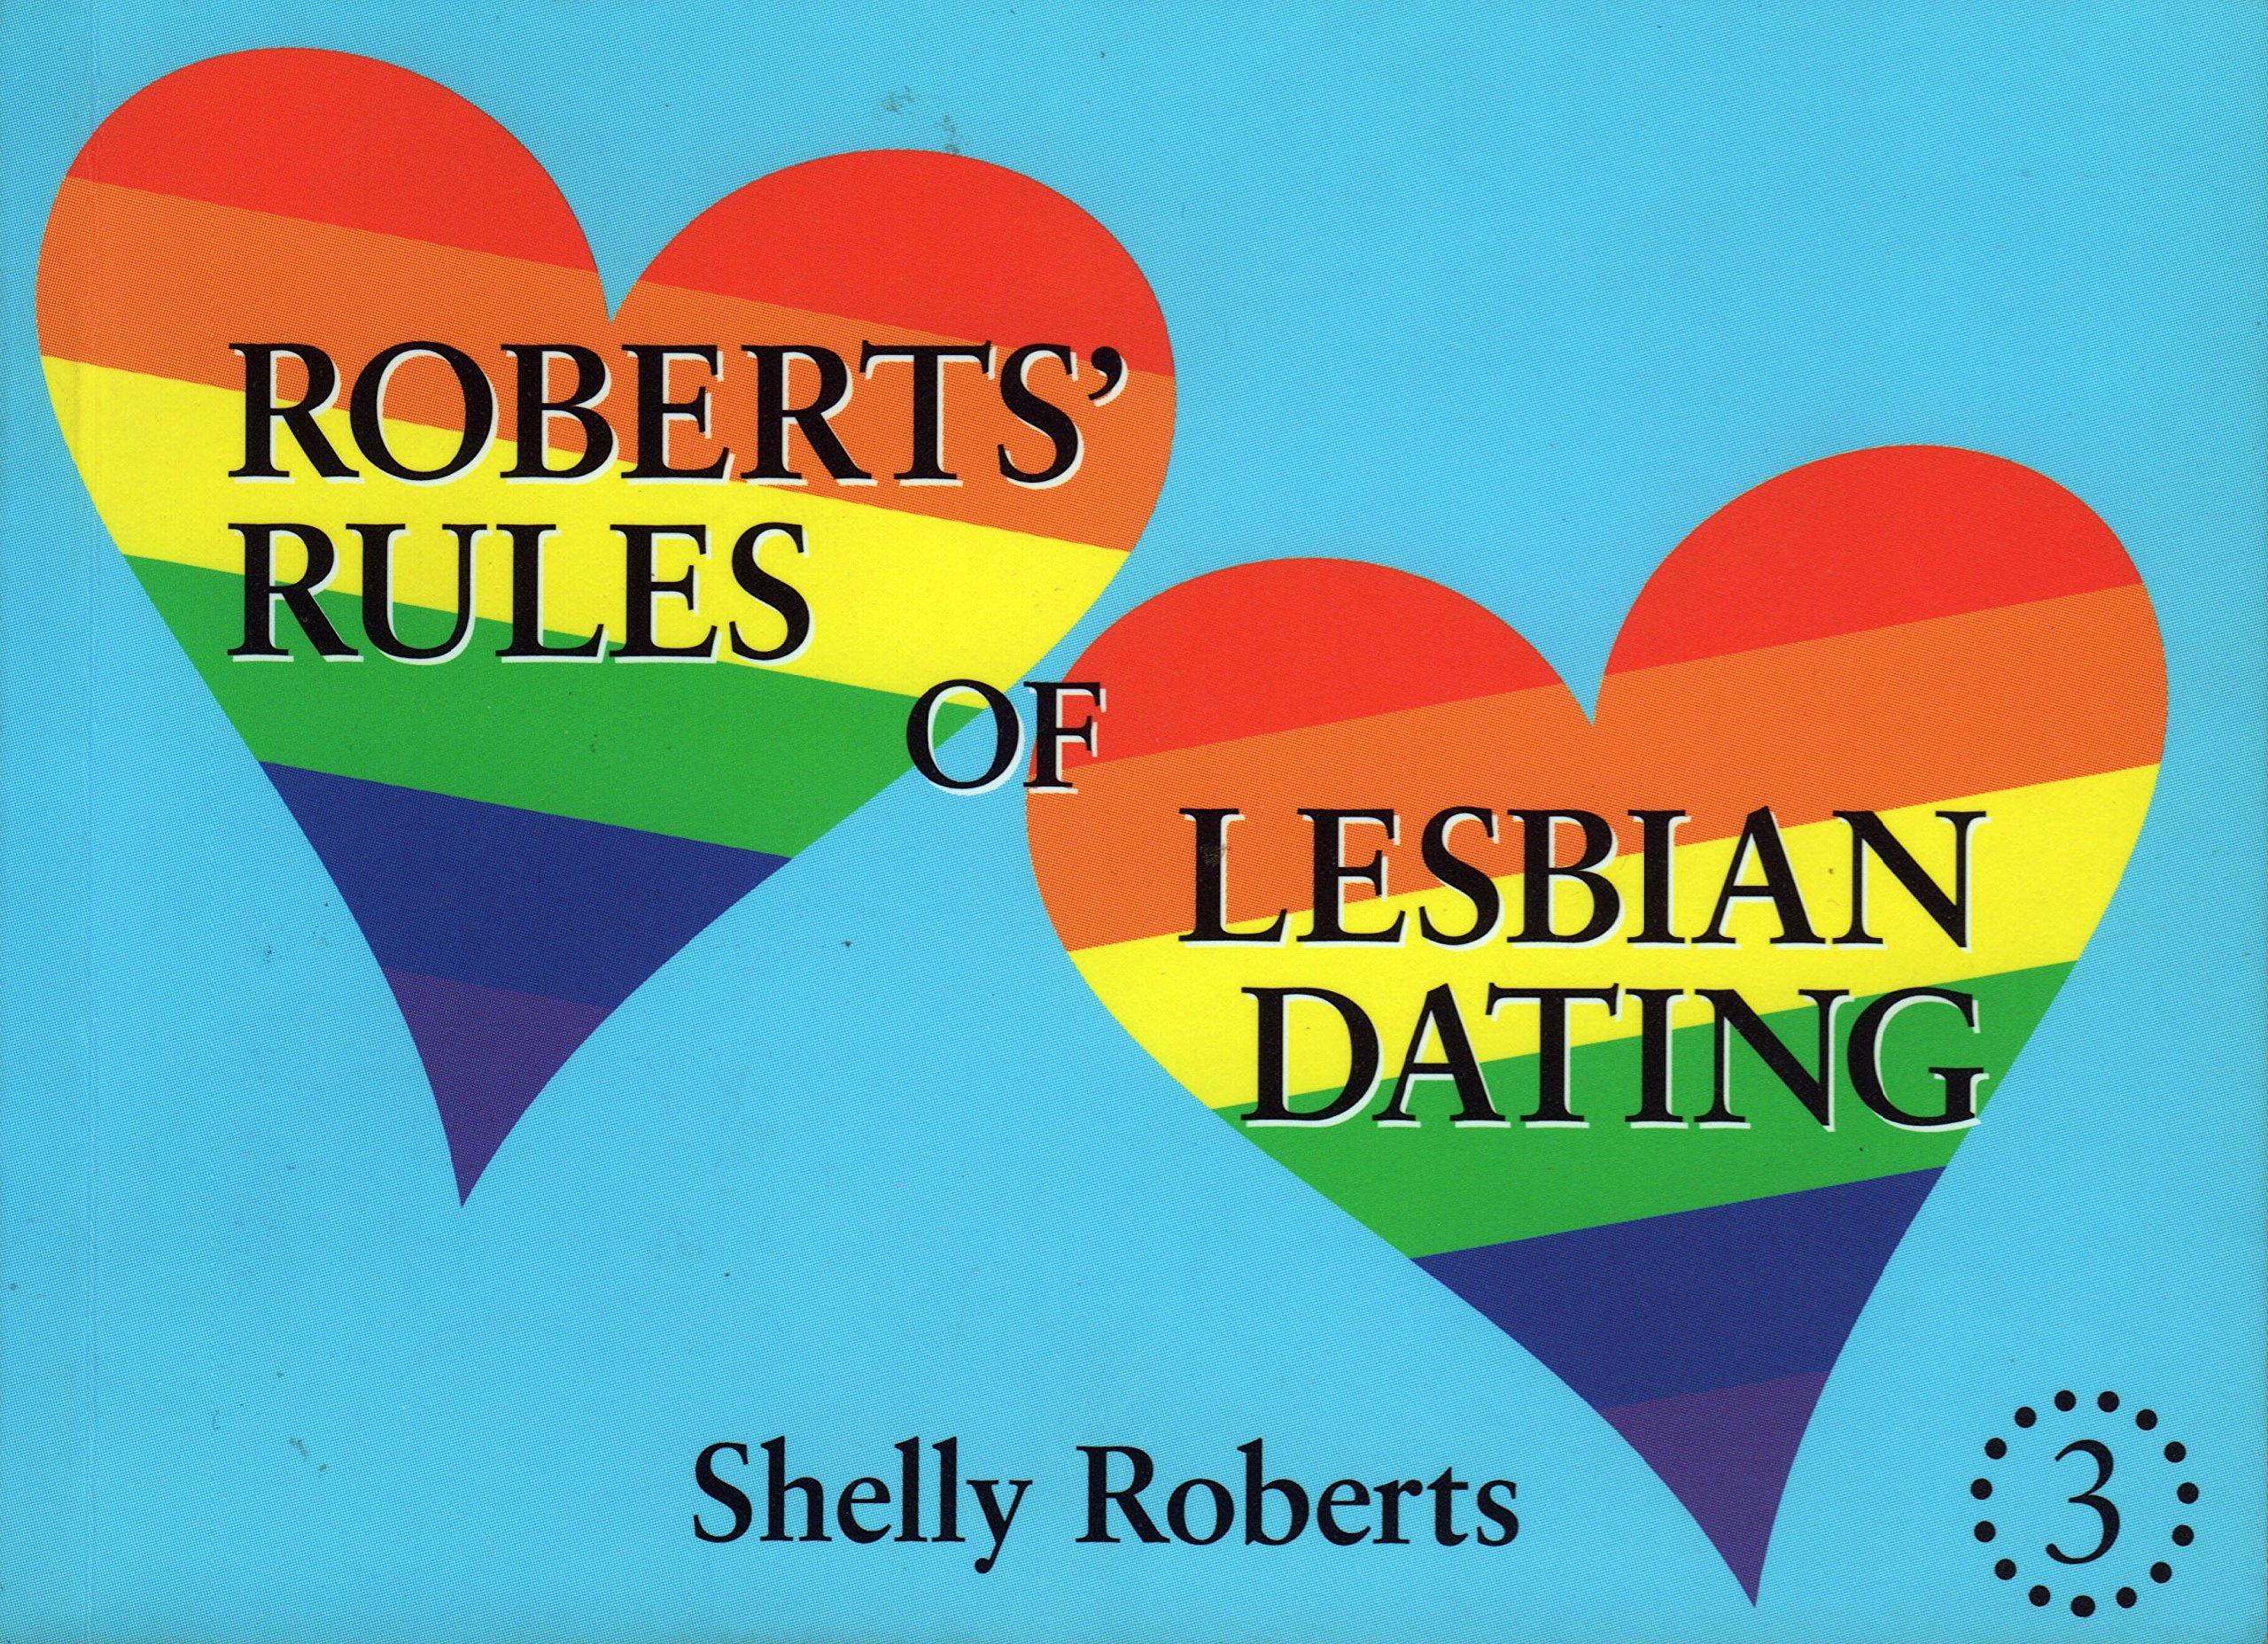 Shelly Roberts Nude Photos 18